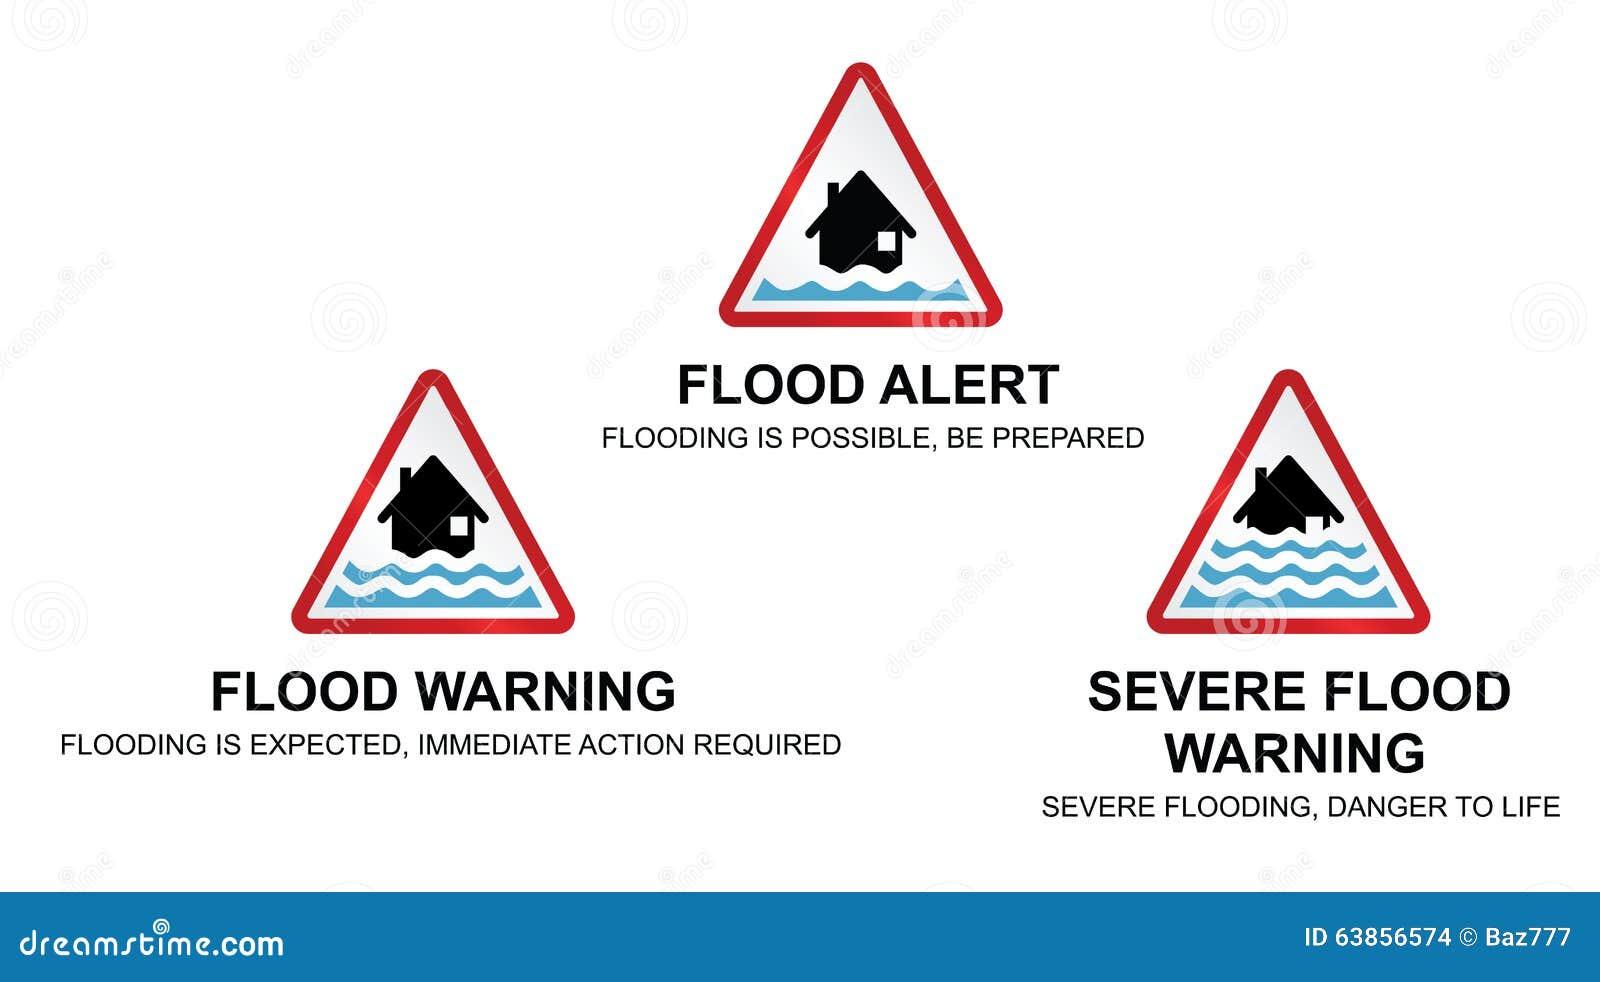 Flood Warning Signs Stock Vector - Image: 63856574